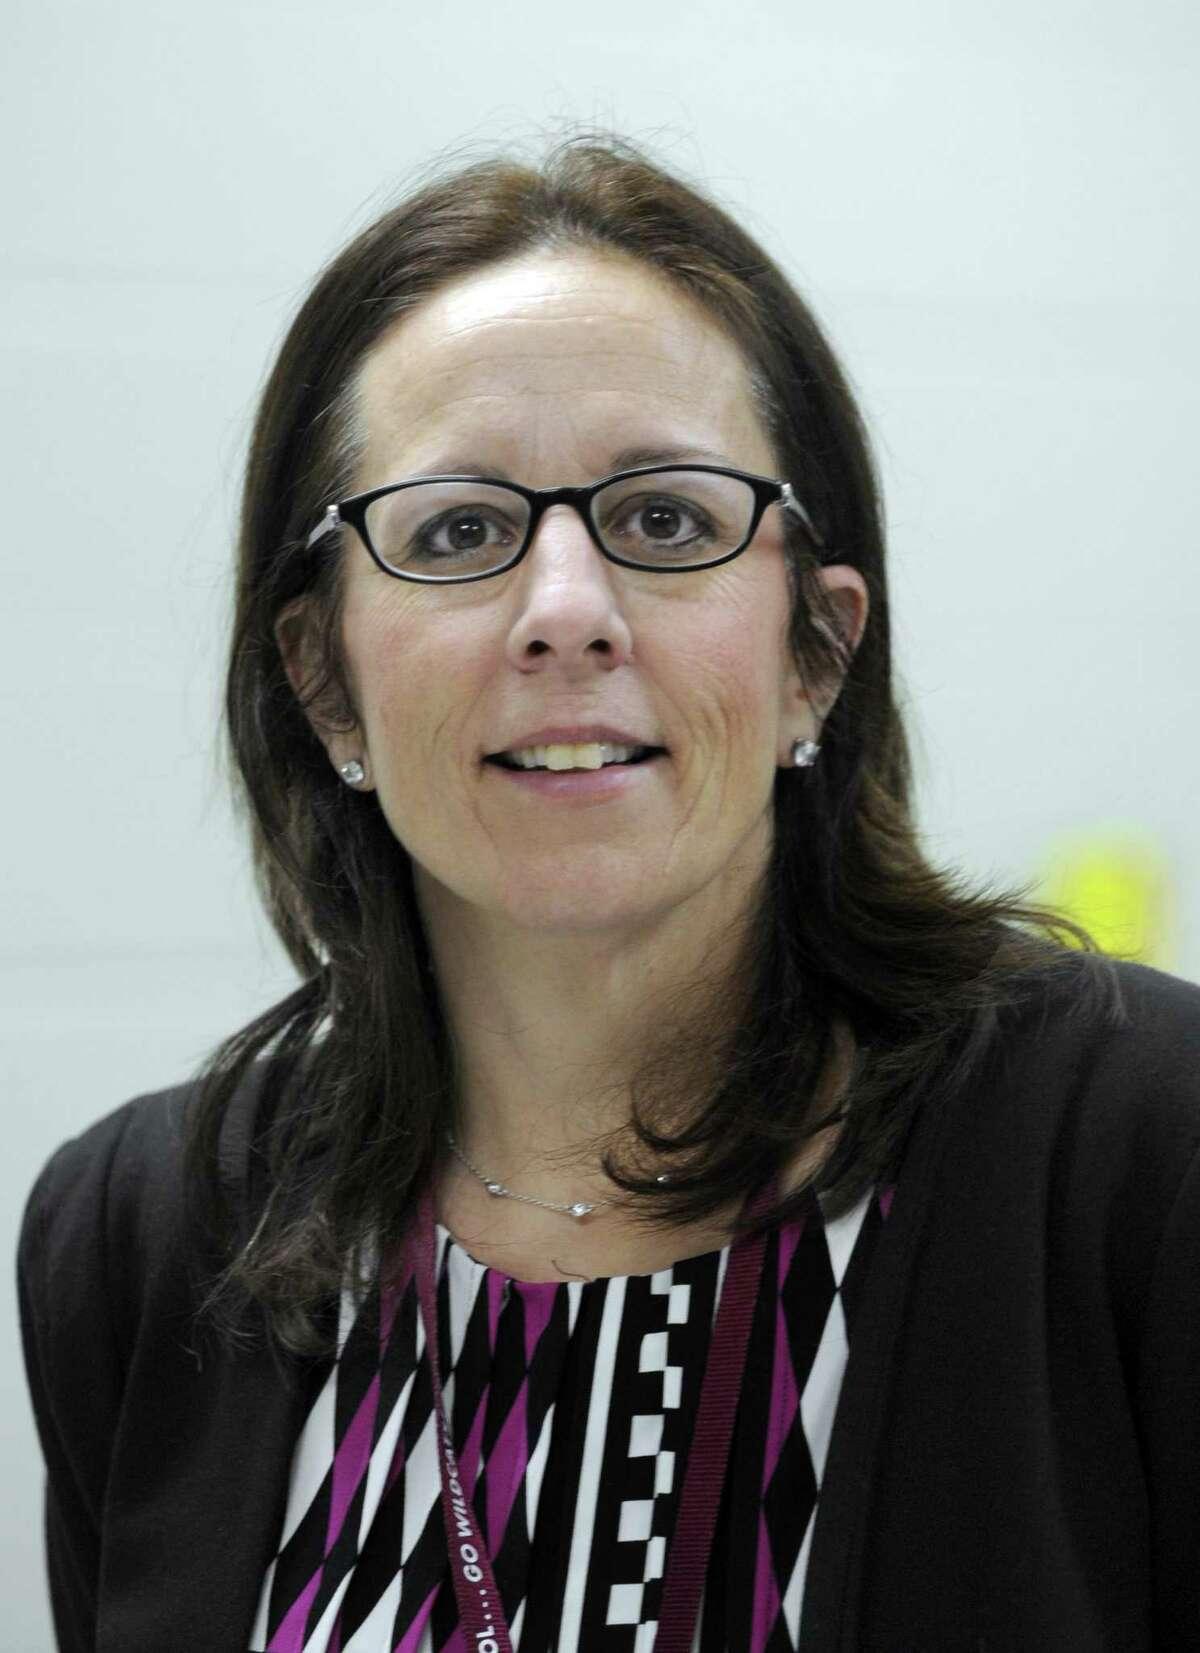 Dr. Christine Carver, superintendent of schools in Bethel.